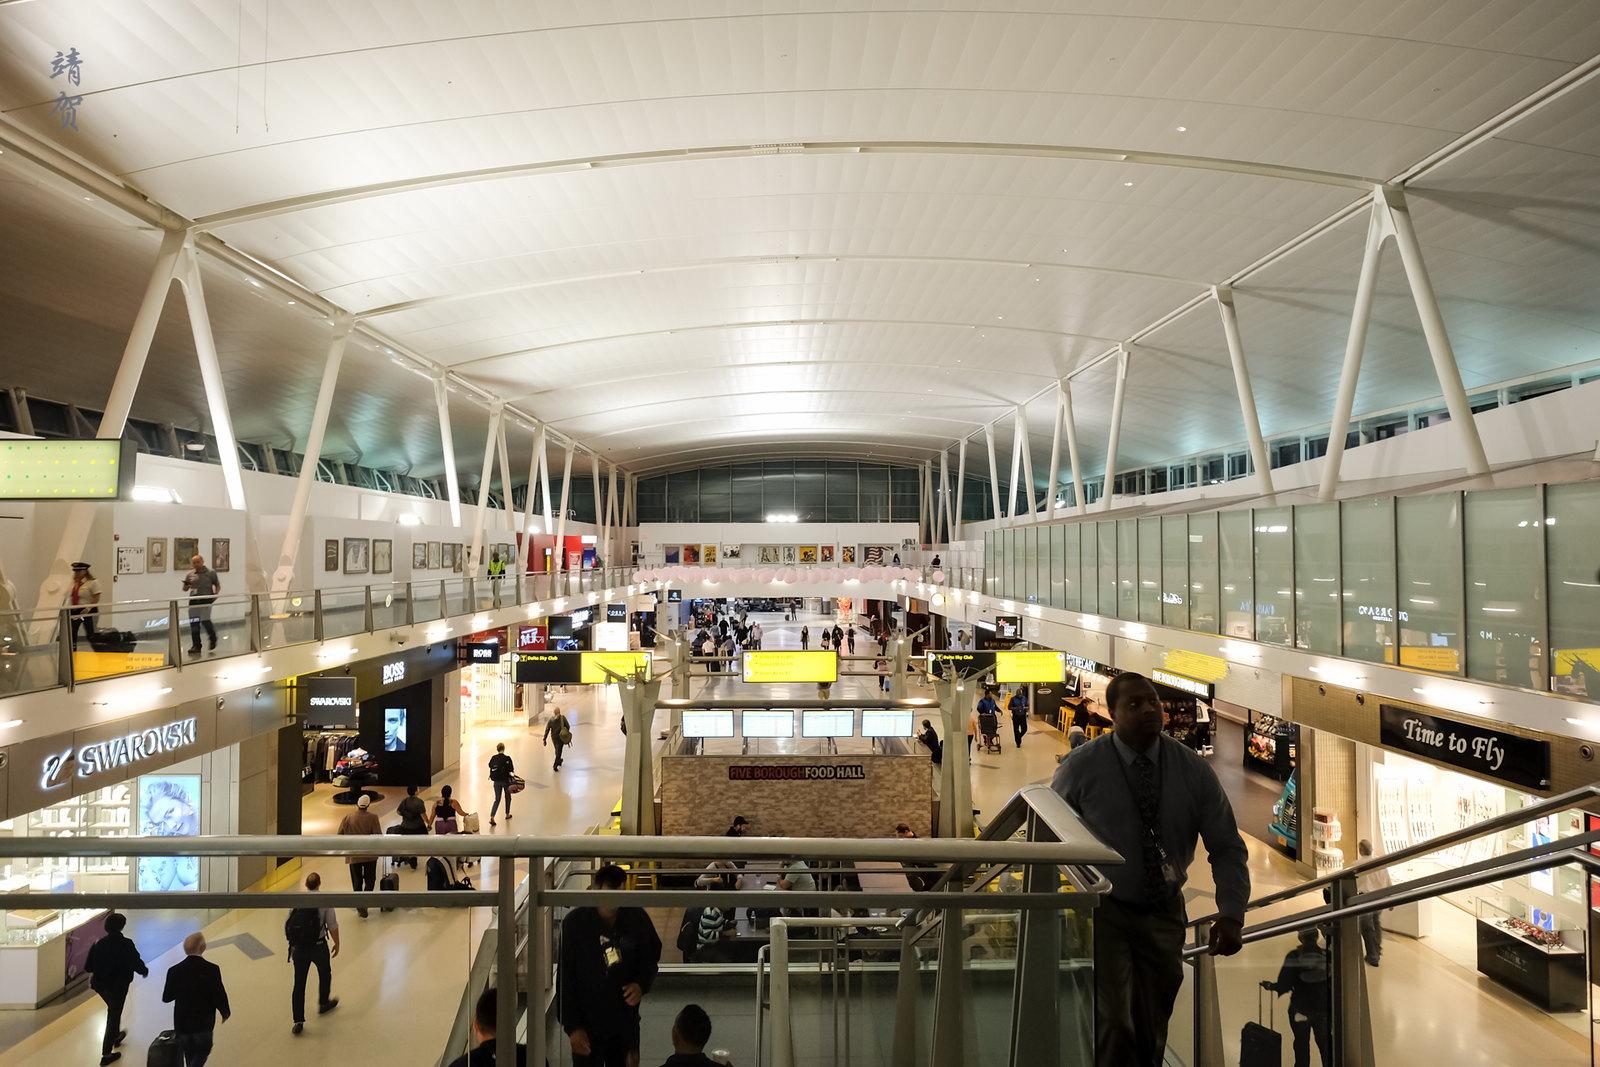 Airside concourse